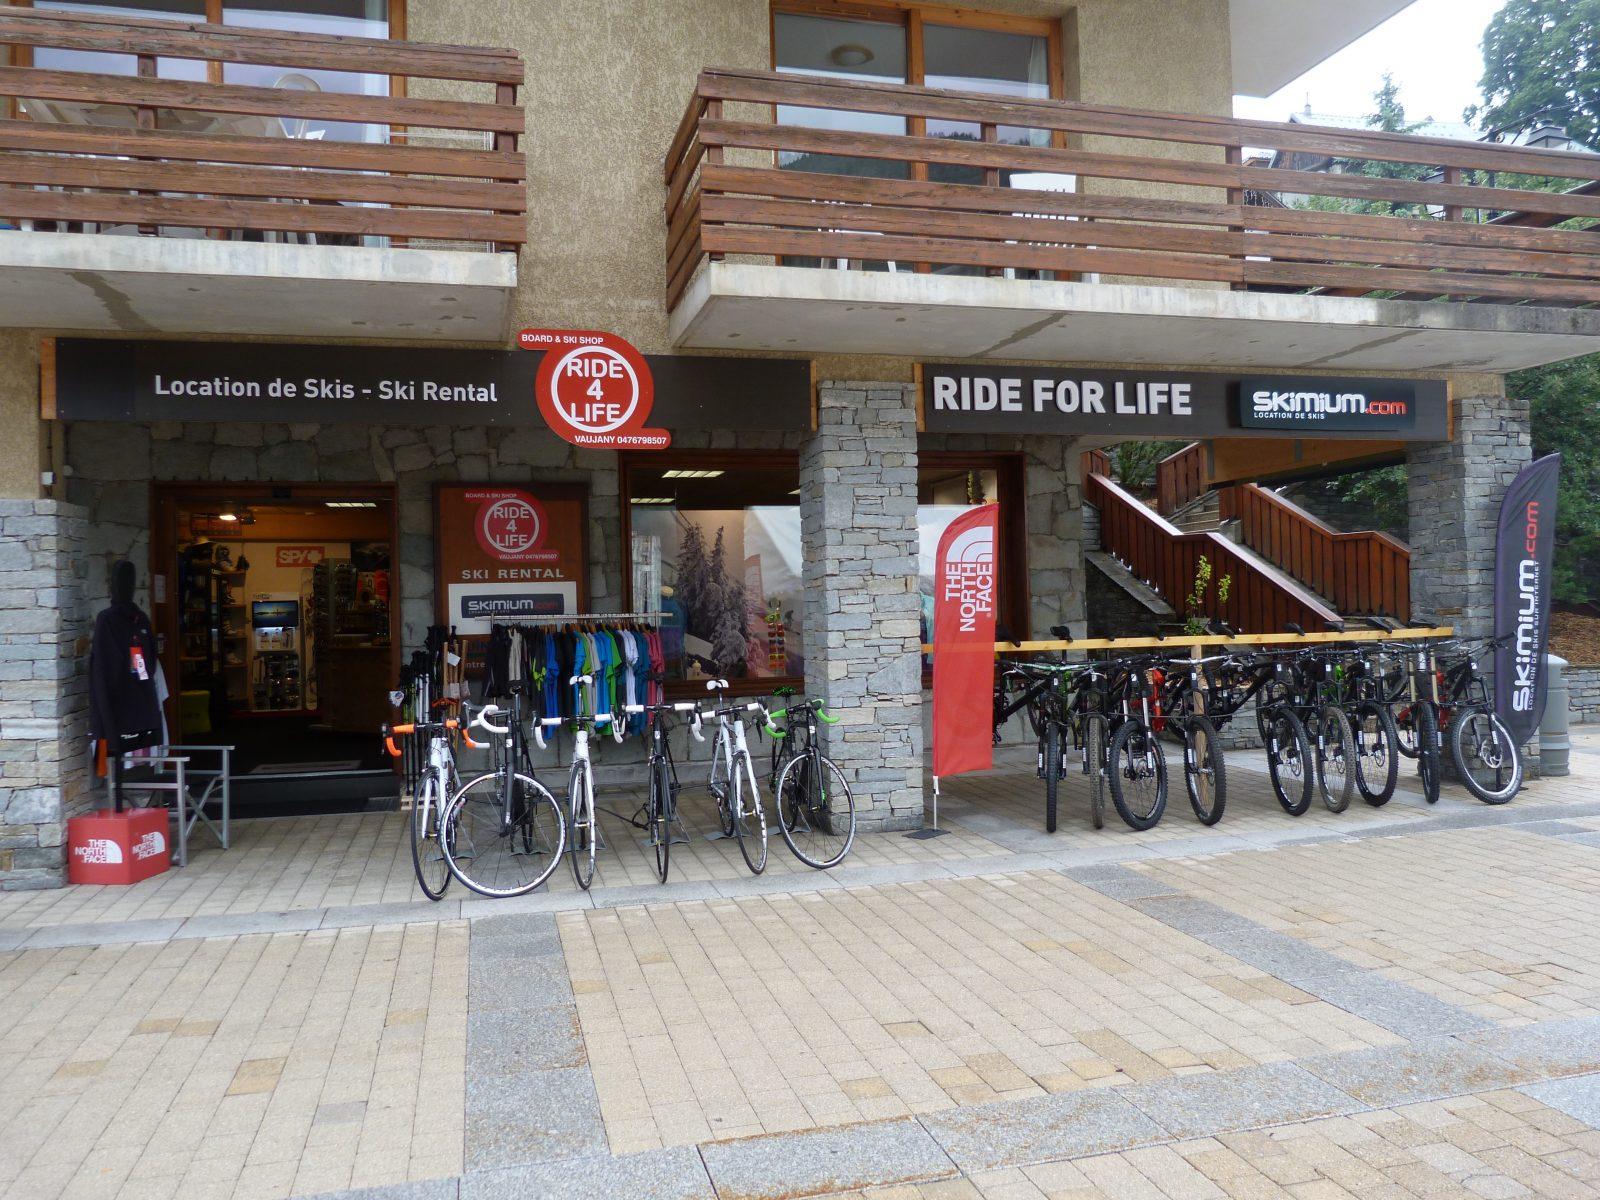 Ride 4 Life (1)